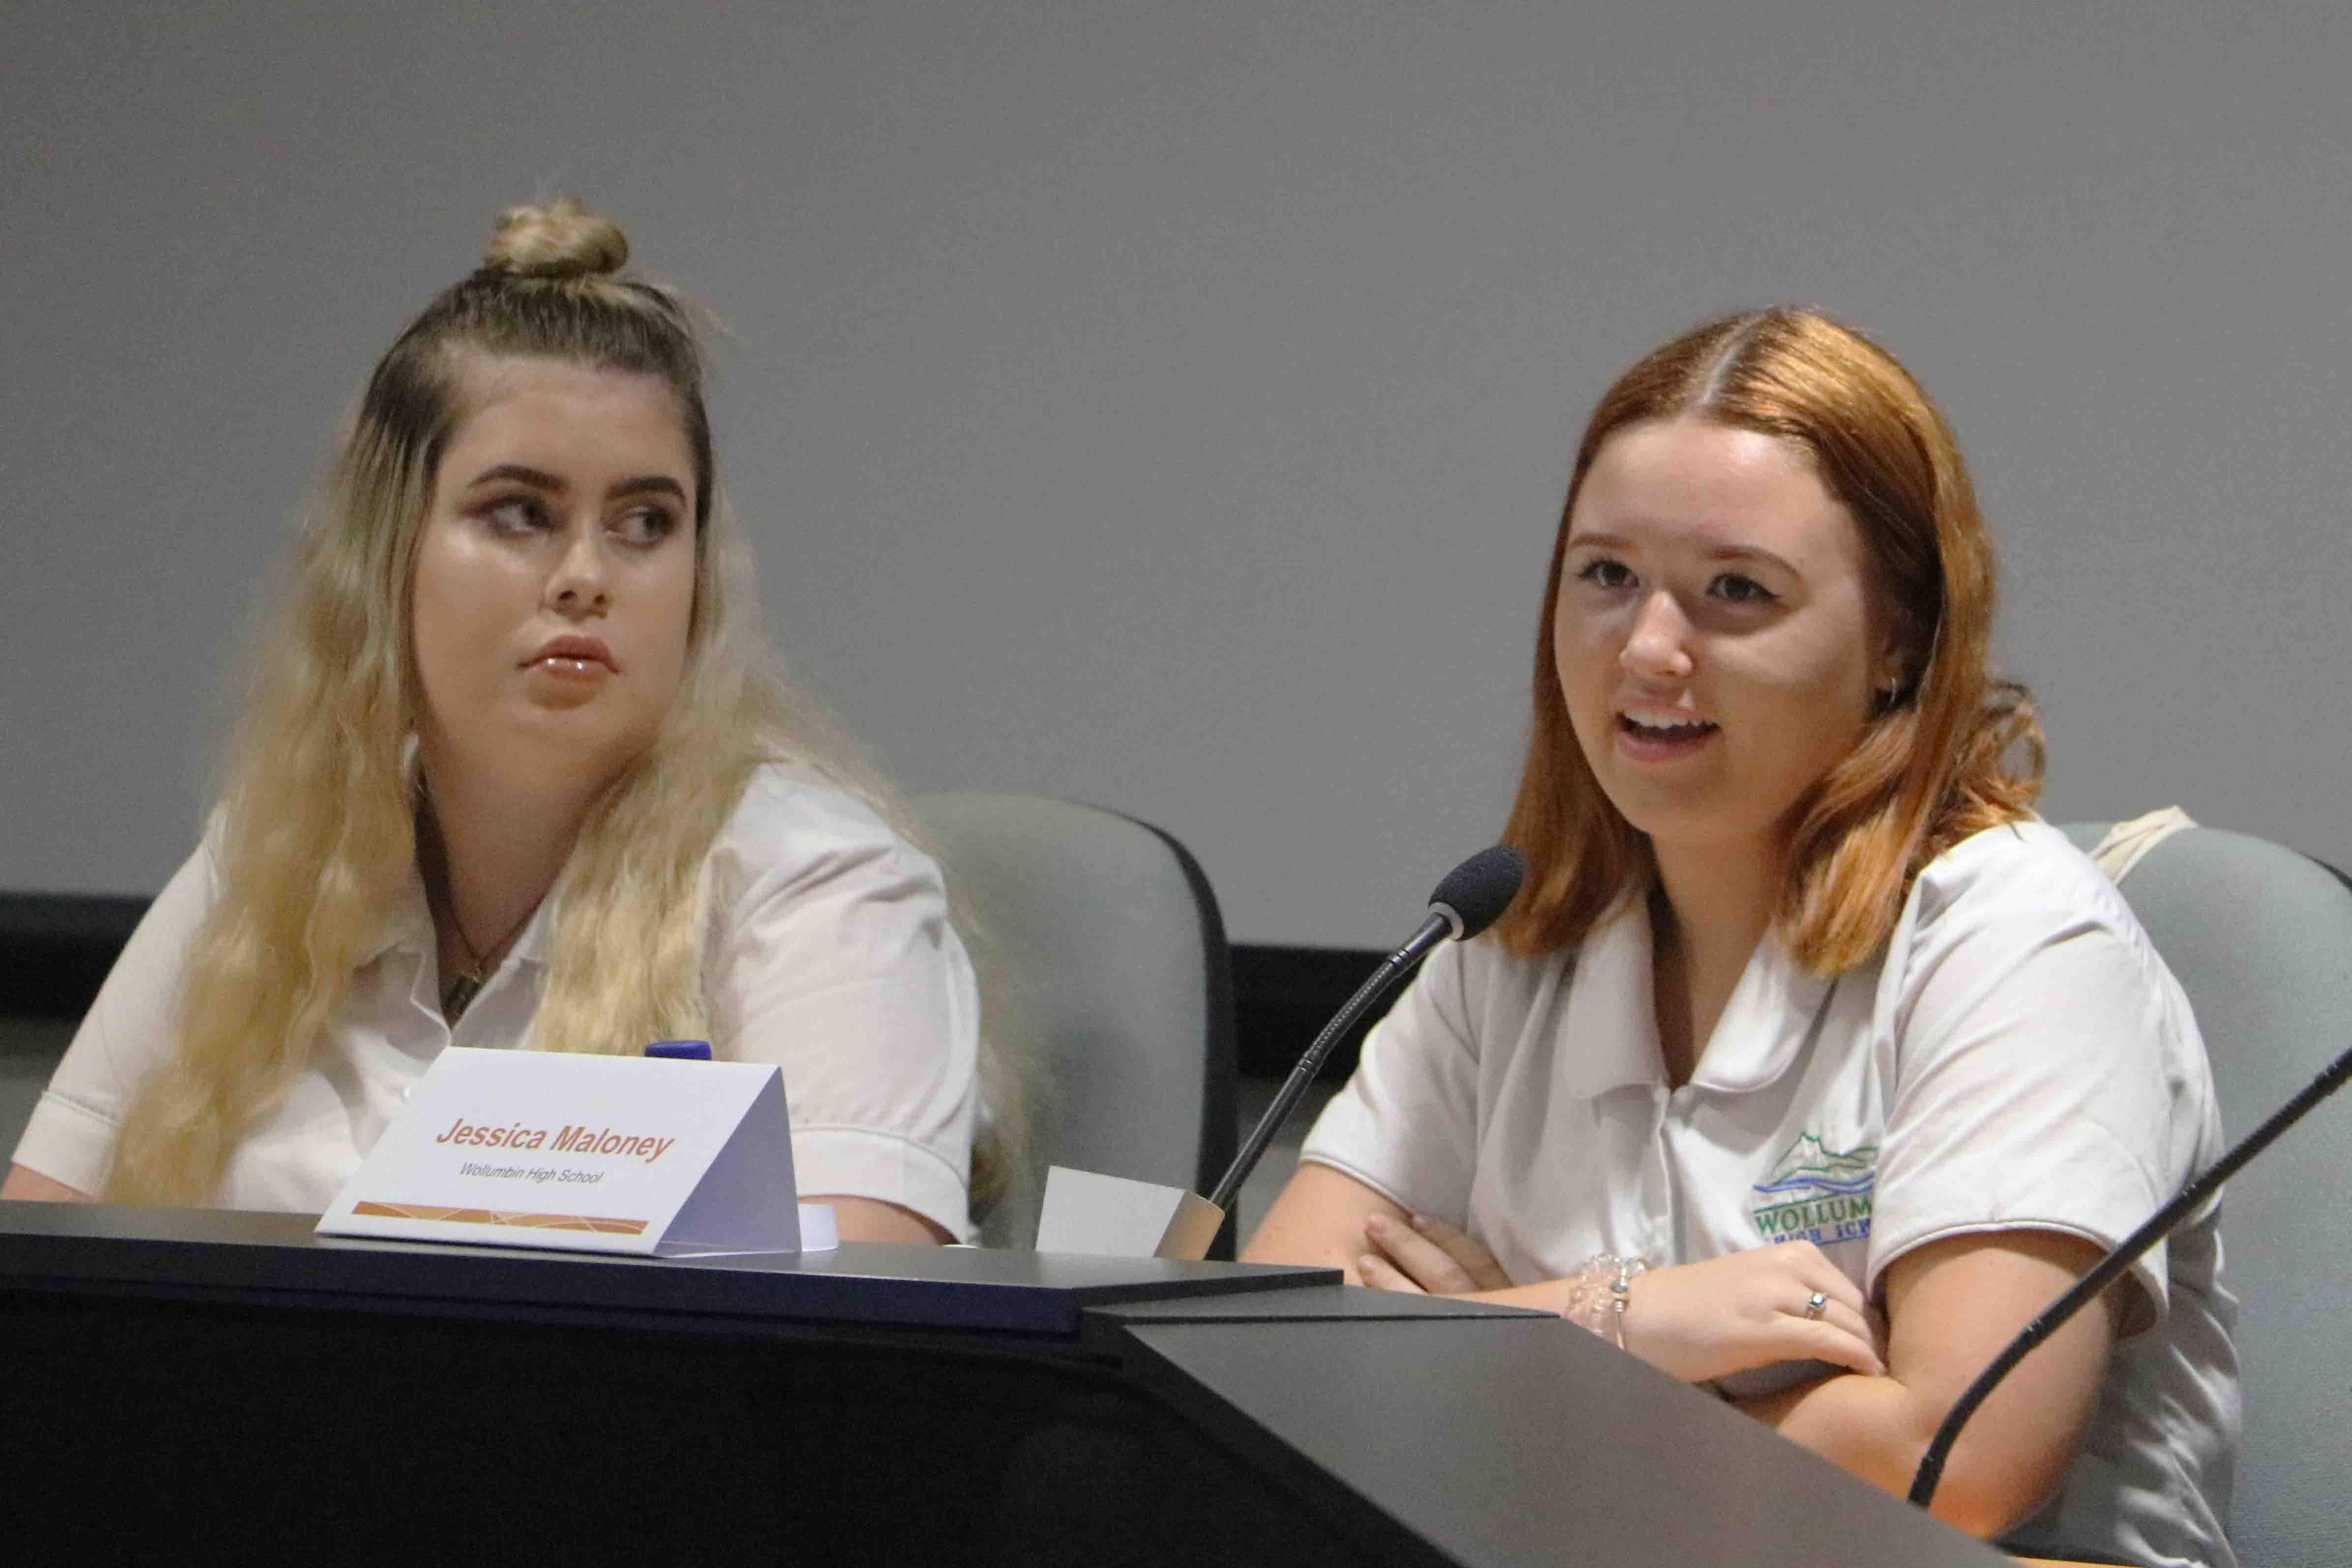 Hannah Carmody and Jessica Maloney